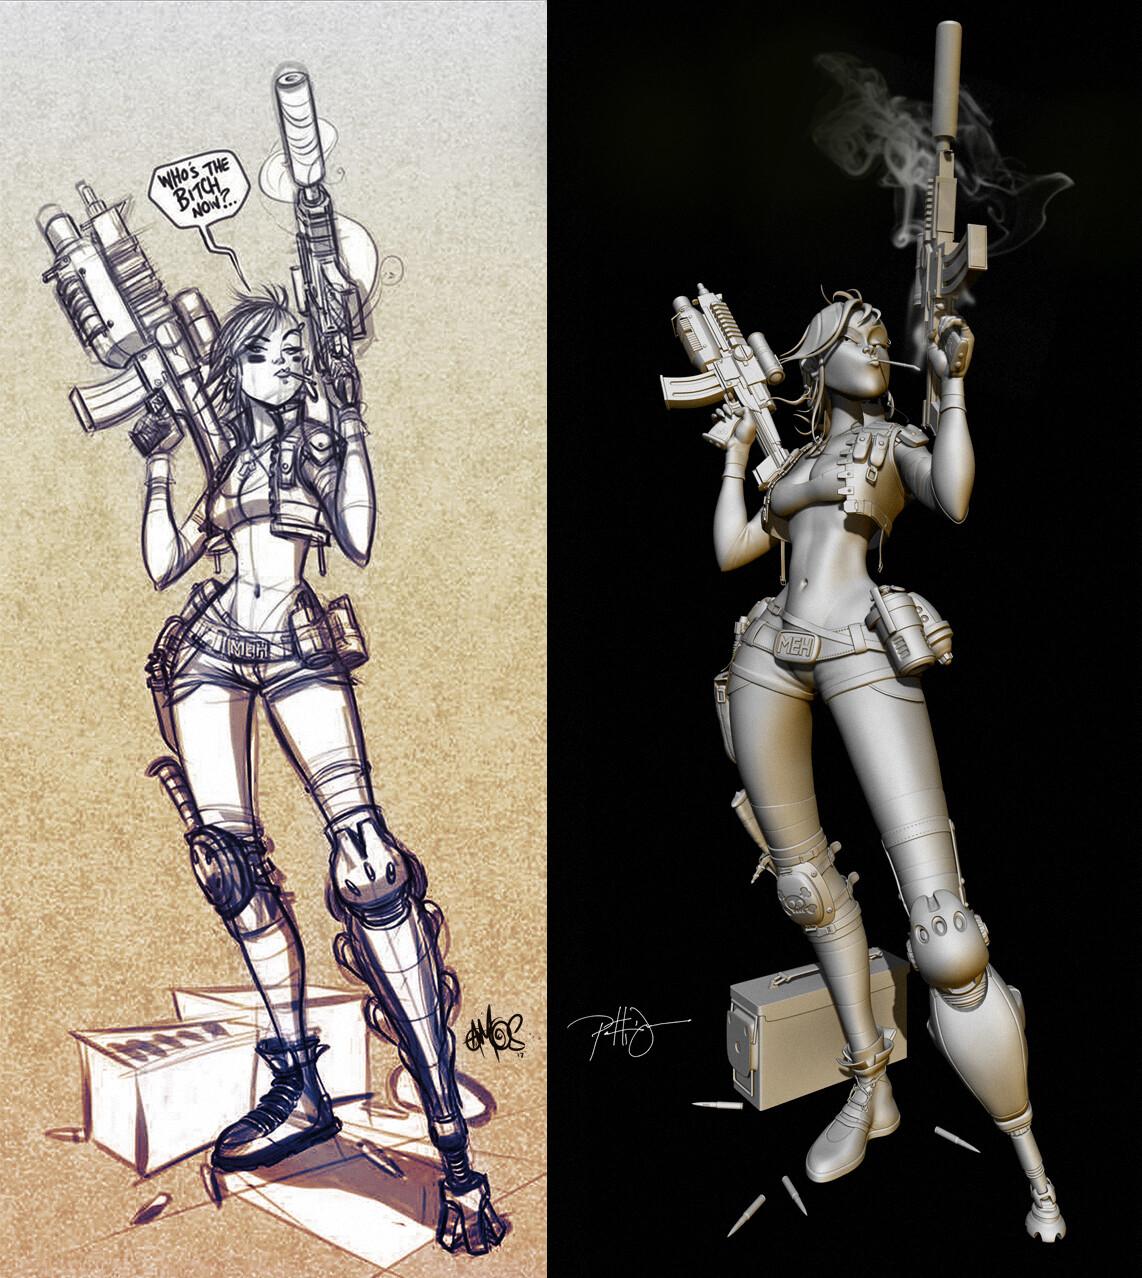 The original sketch by John Amos & my sculpt